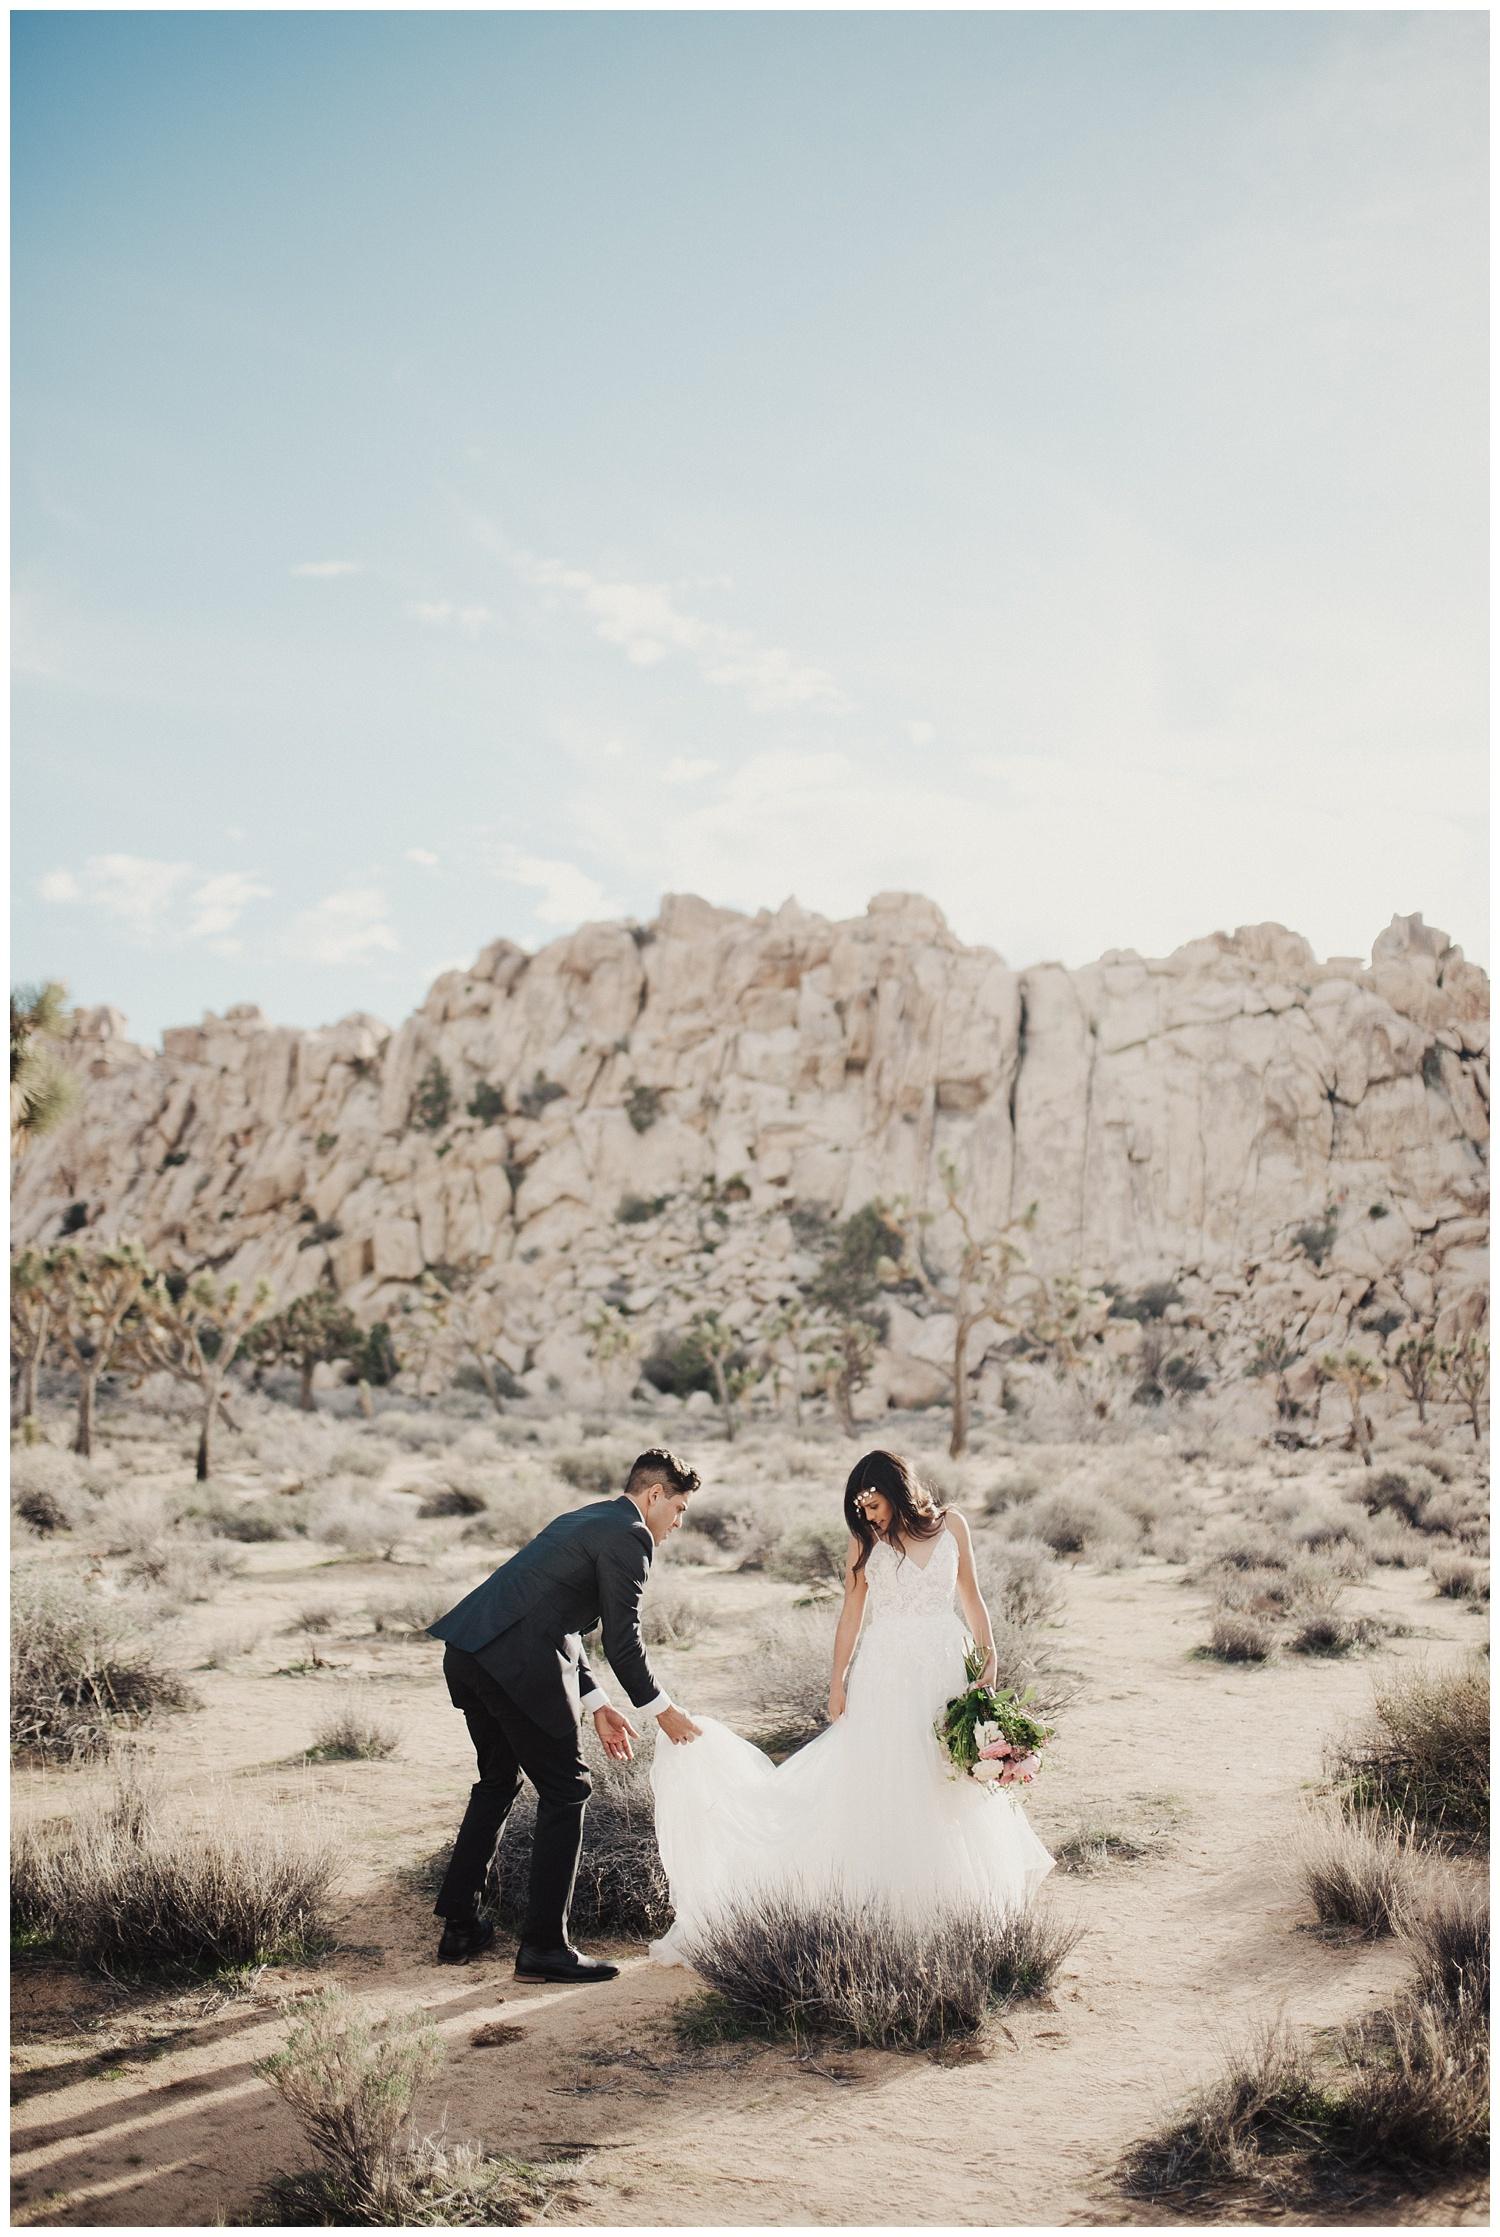 Bridal Session in Joshua Tree California